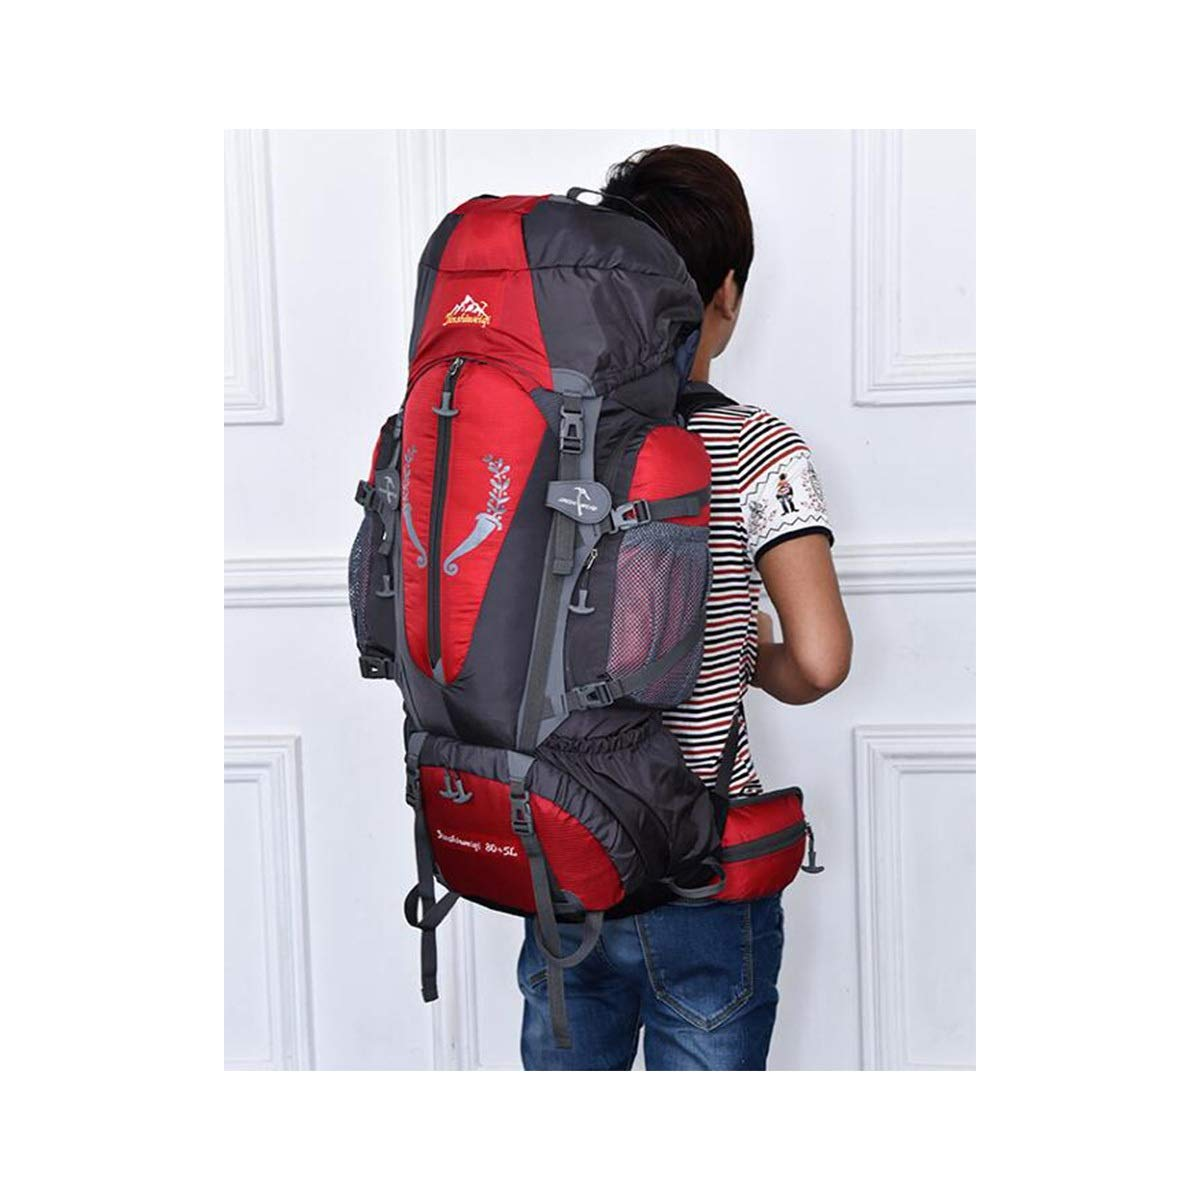 Qingduqijian Internal Frame Backpack Outdoor Waterproof Mountaineering Bag Men and Women Outdoor Hiking Camping Bag -80L Color : Black